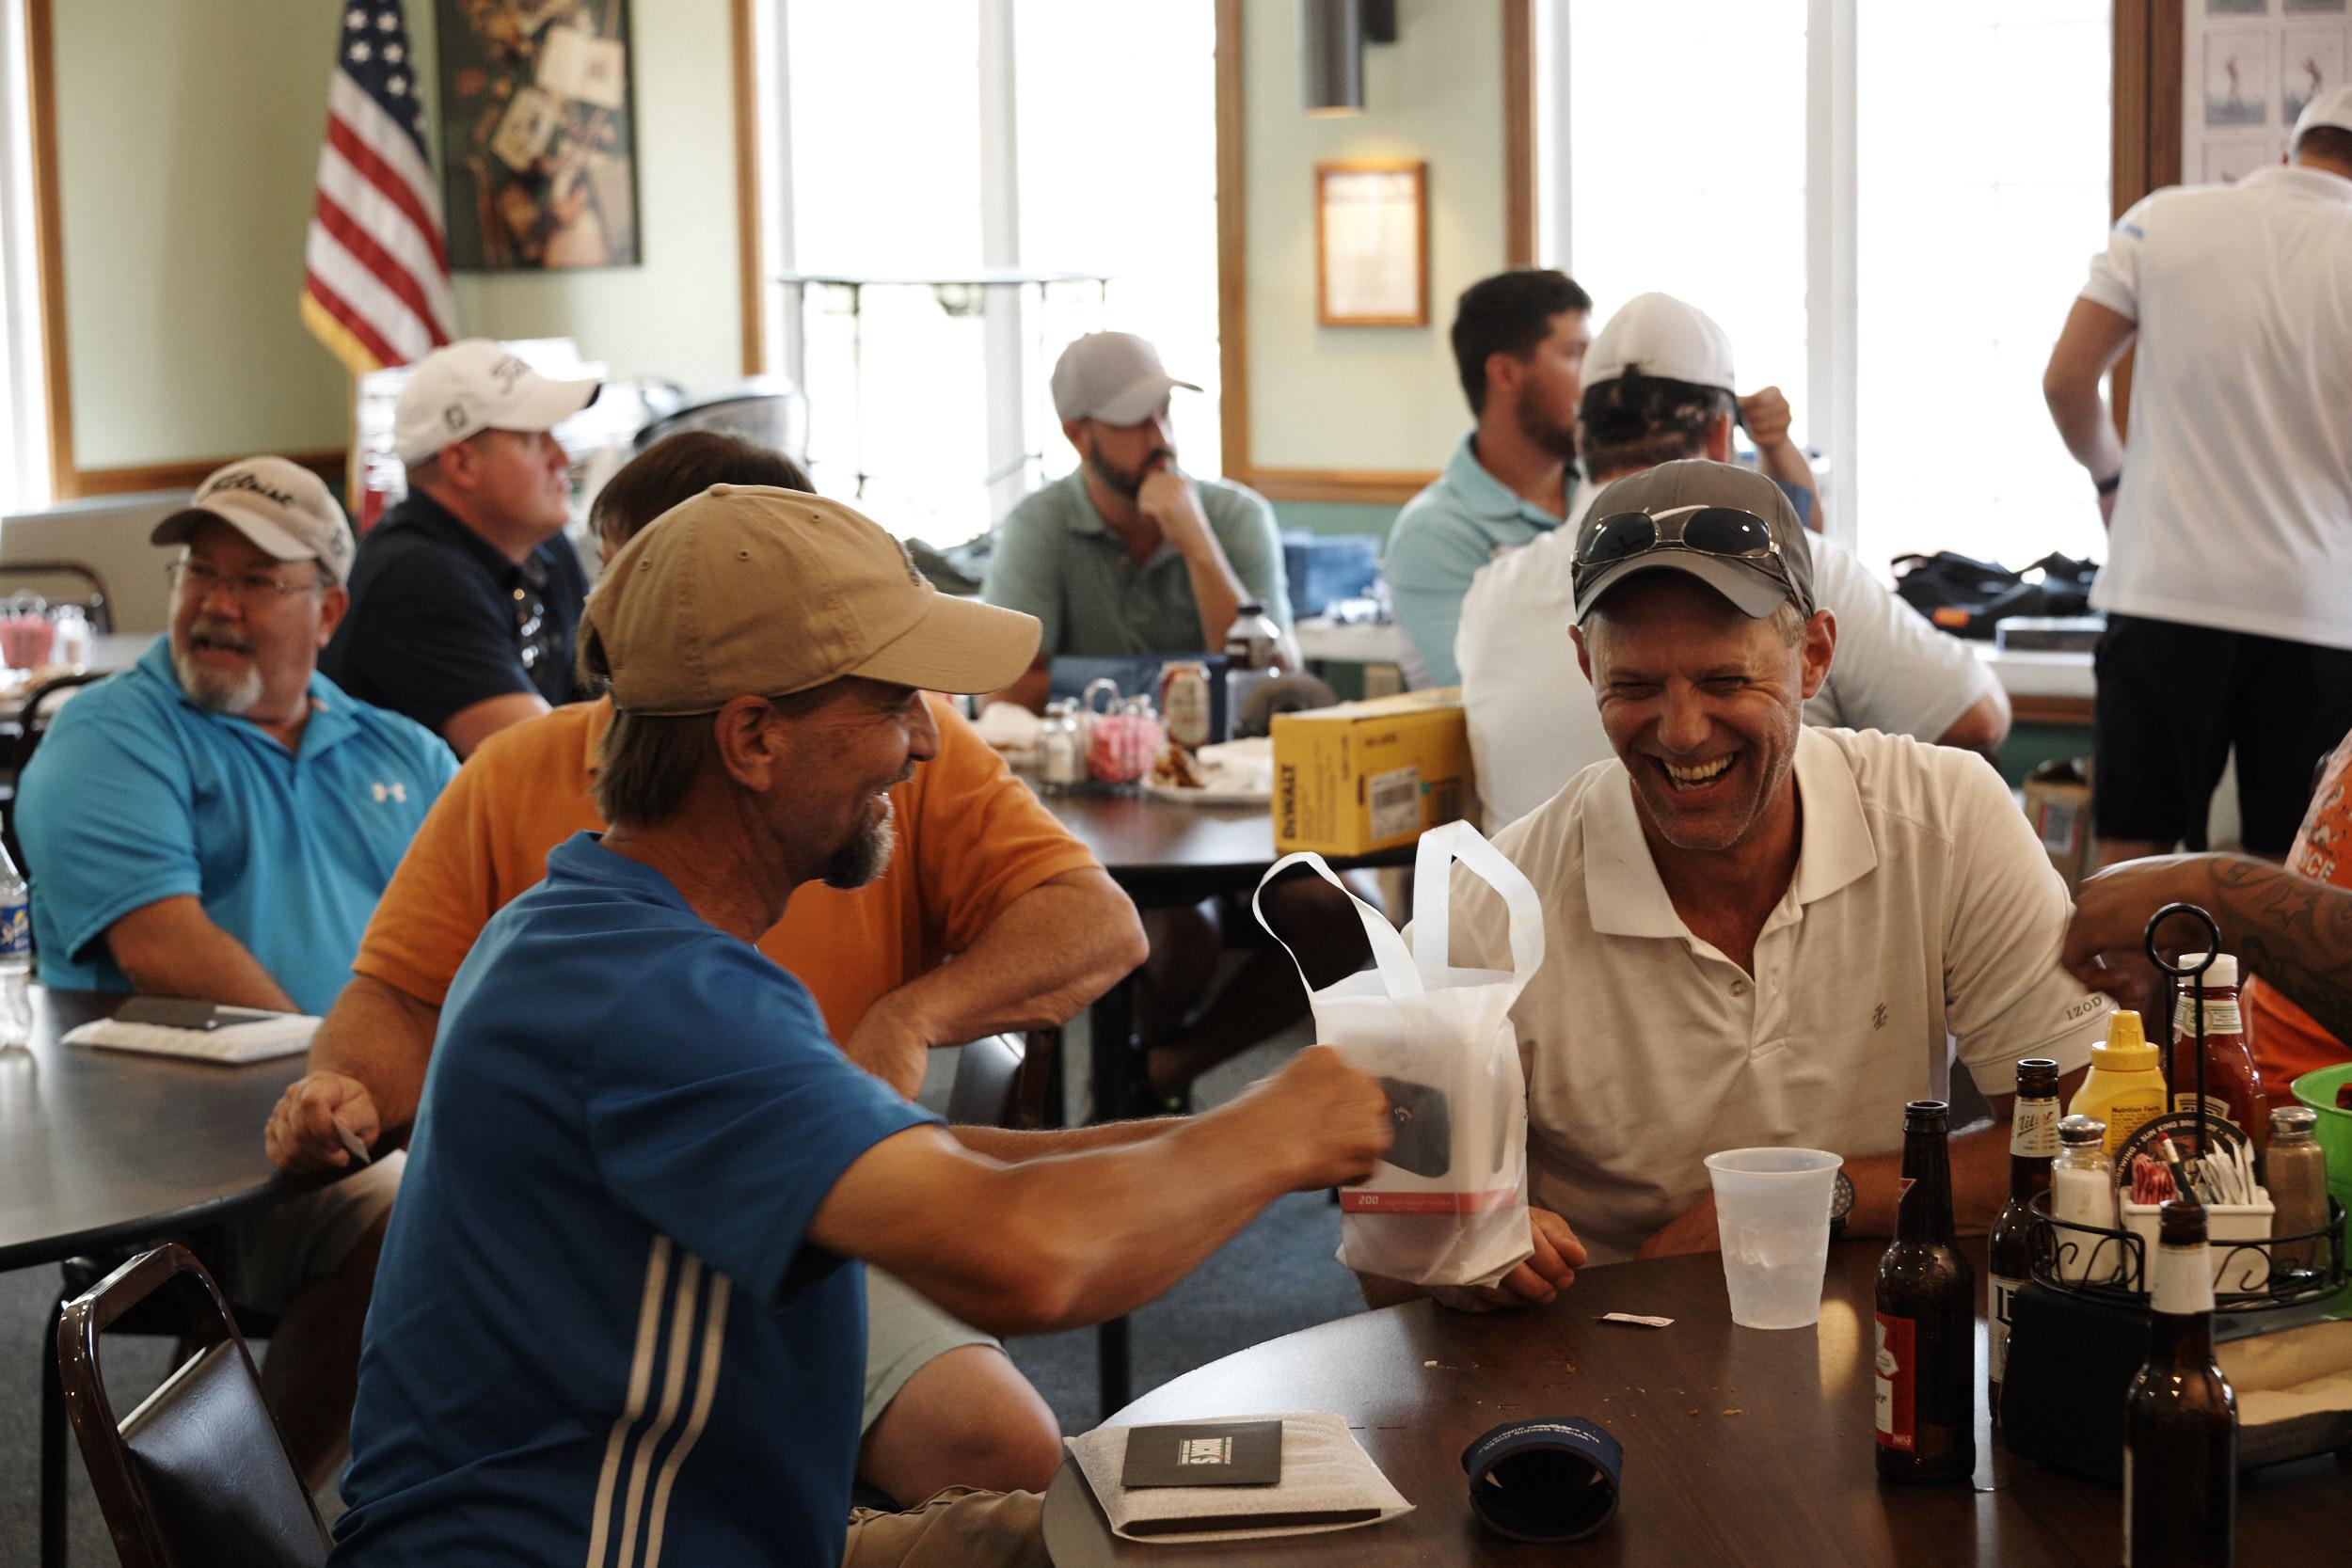 20180728 MTM Golf Outing - Tim Schumm Photography 023.jpg